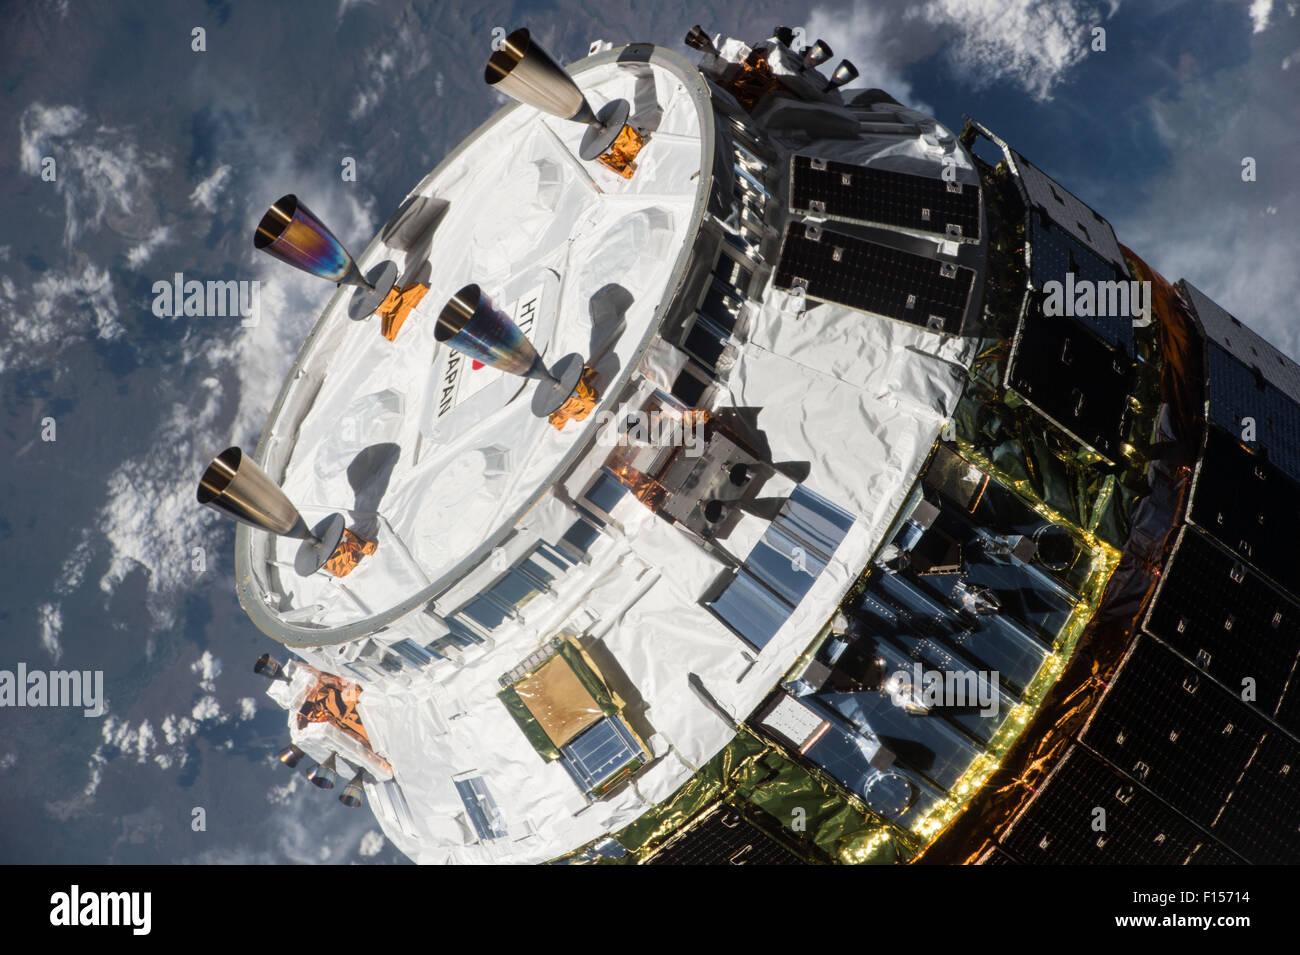 The Japan Aerospace Exploration Agency Kounotori 5 H-II Transfer Vehicle cargo spacecraft approaches the International - Stock Image